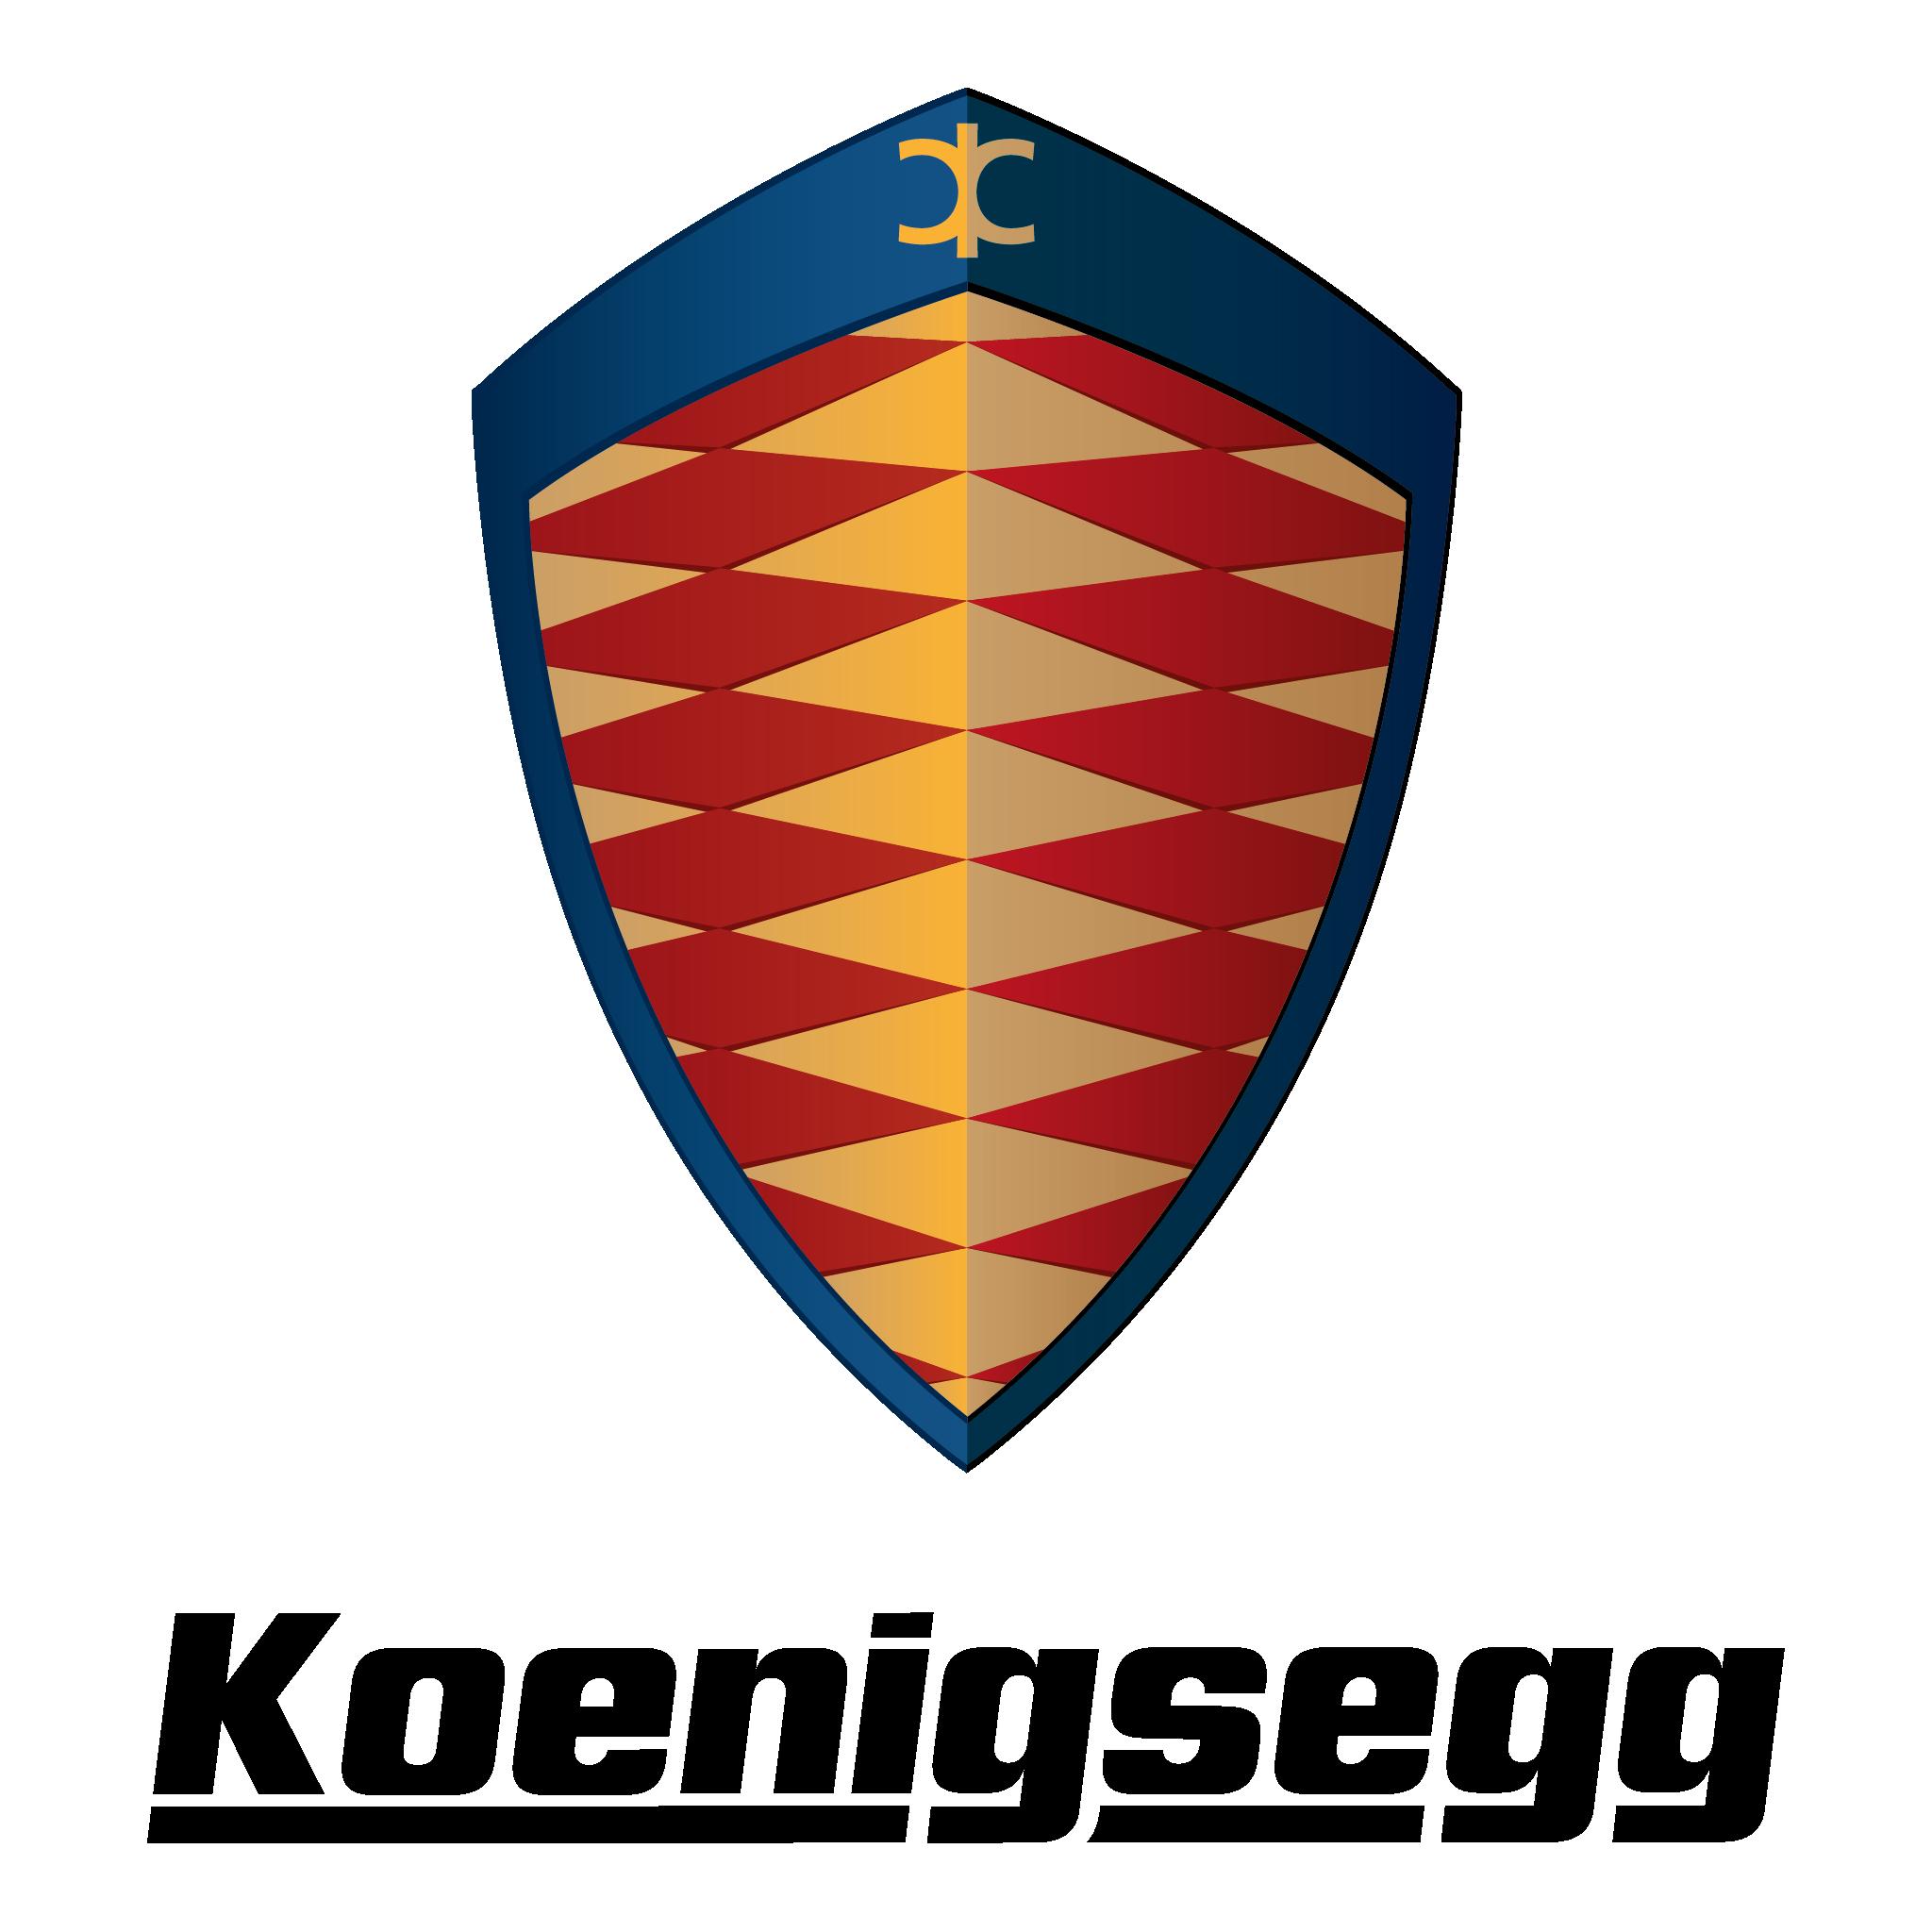 Koenigsegg-logo-1994-2048x2048.png